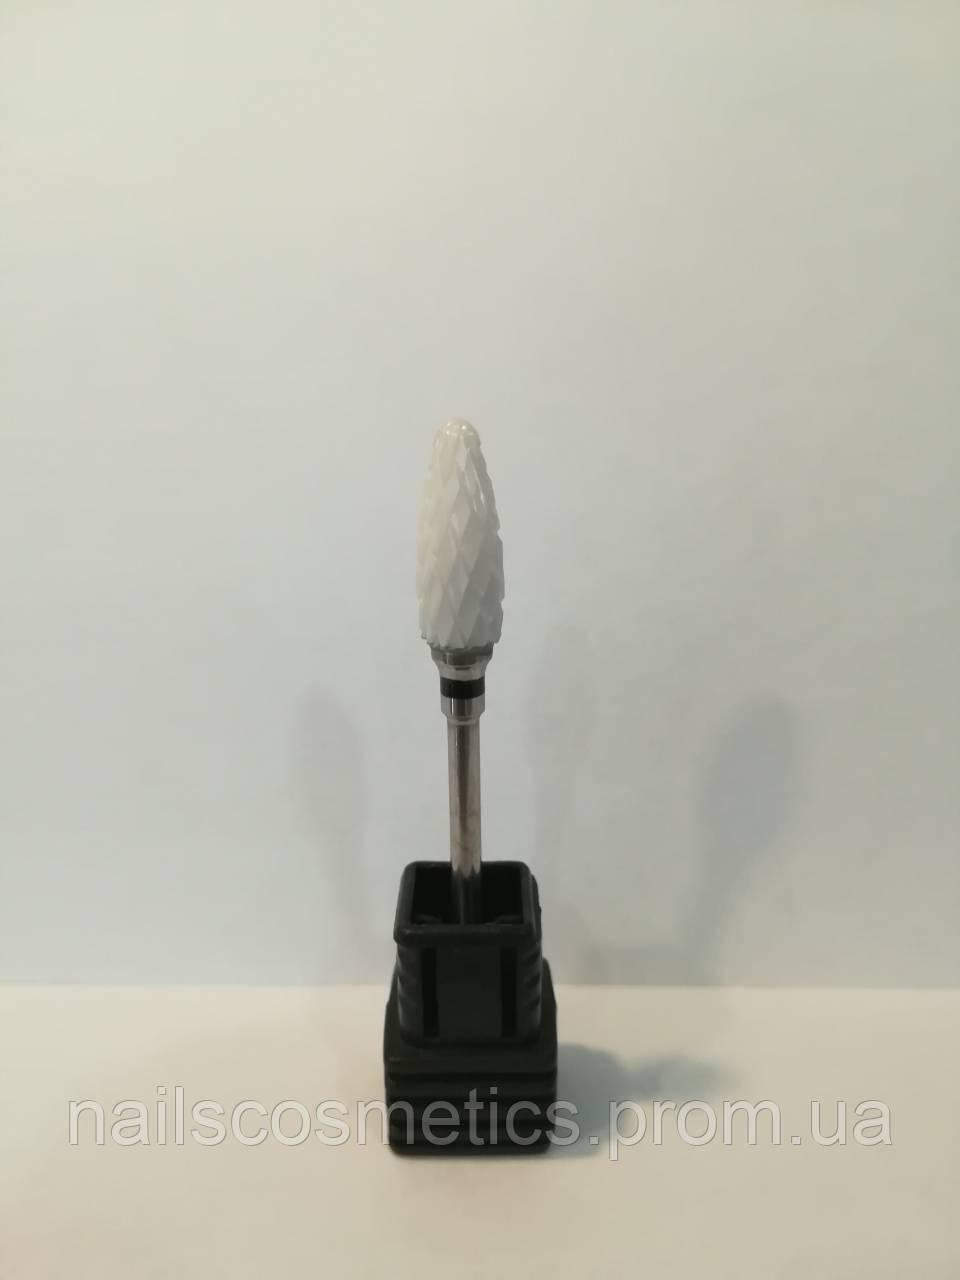 "№15 ХС 3/32"" Flame ST (C) фреза керам. для гель-лака ""Черная"" Кукурузка"